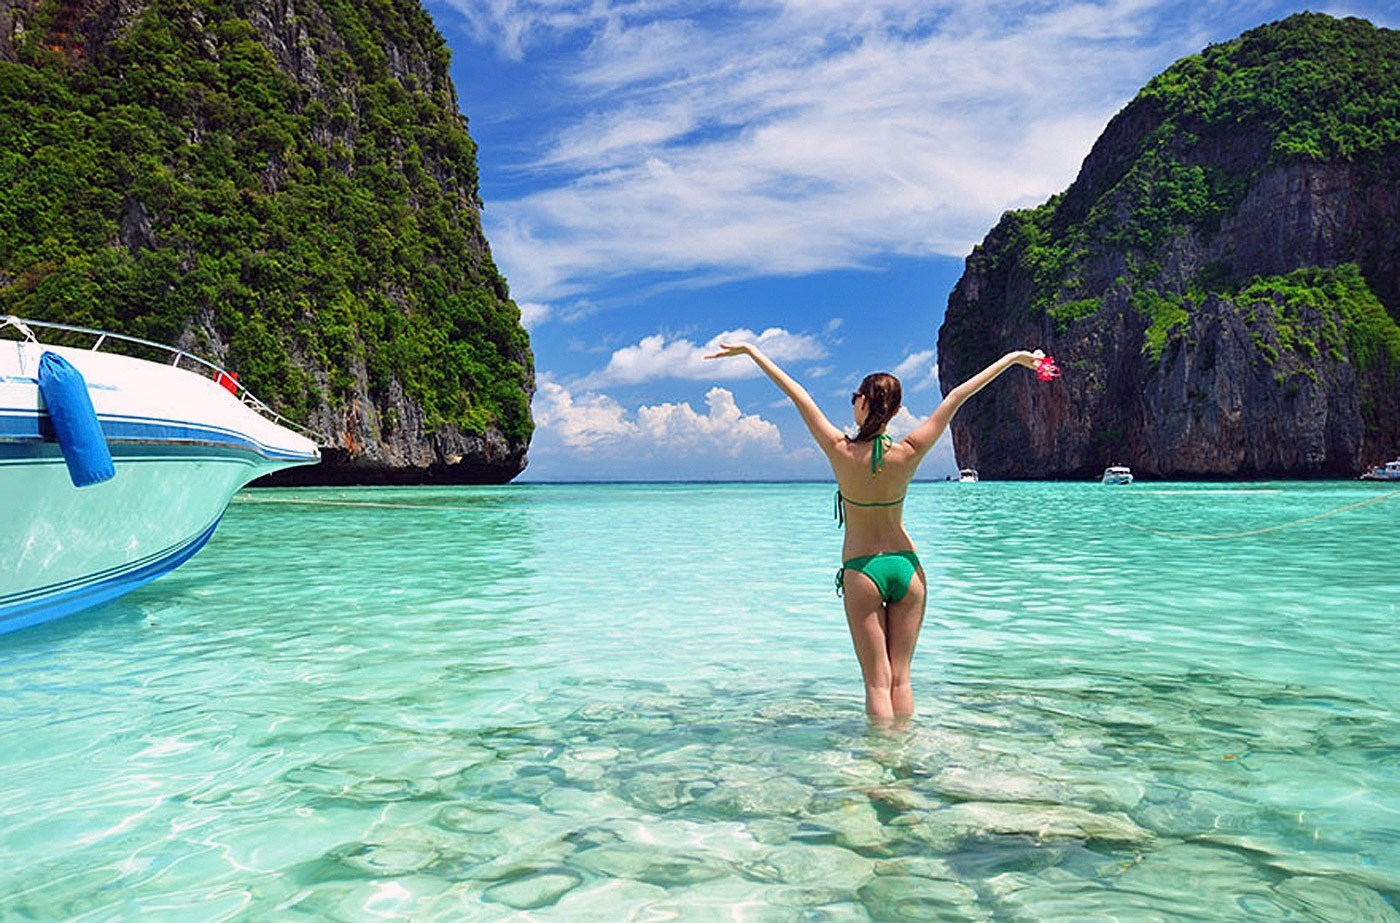 trải nghiệm-du lịch-du lịch-krabi